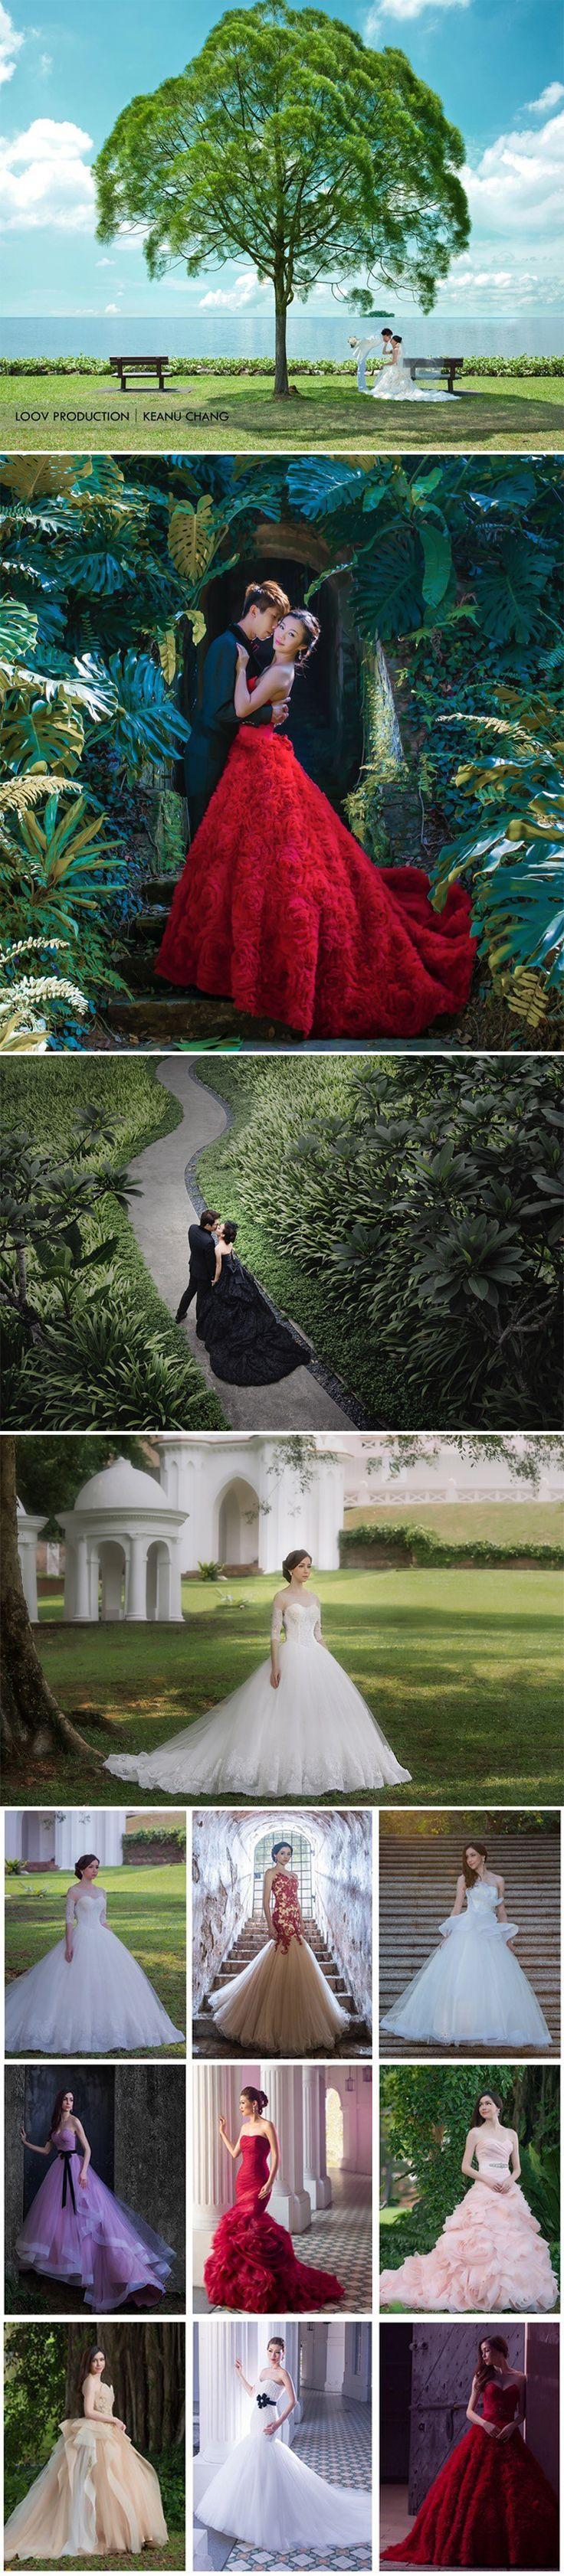 Best outdoor prewedding photography ideas wallpaper hd pre wedding props diy of poses in saree laptop high resolution